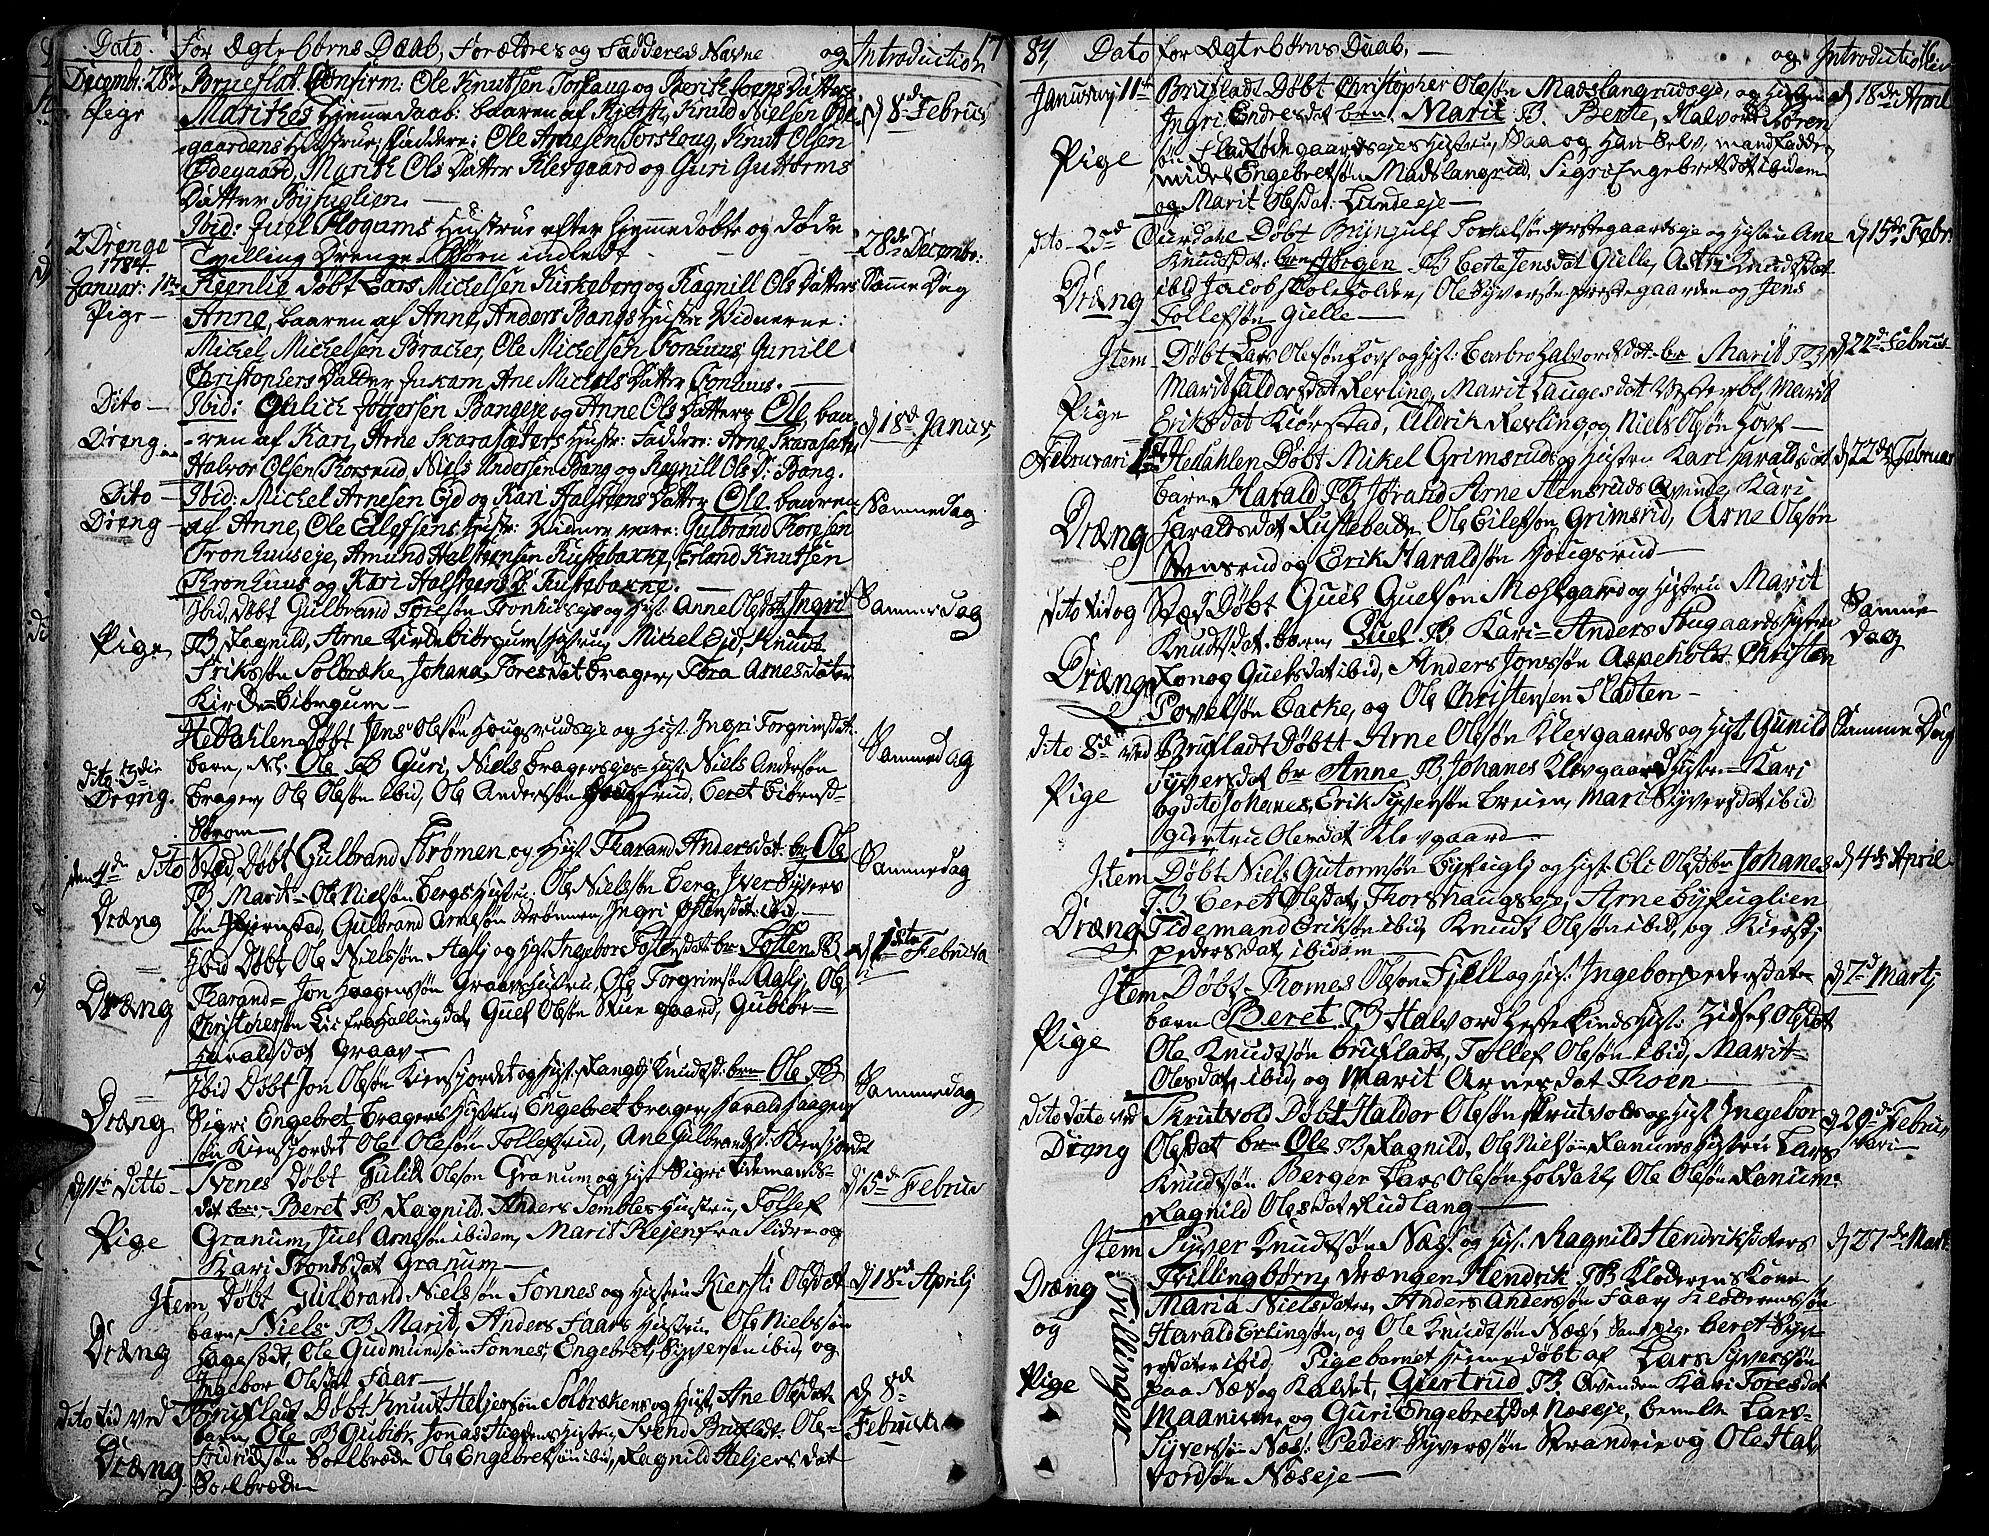 SAH, Aurdal prestekontor, Ministerialbok nr. 6, 1781-1804, s. 16